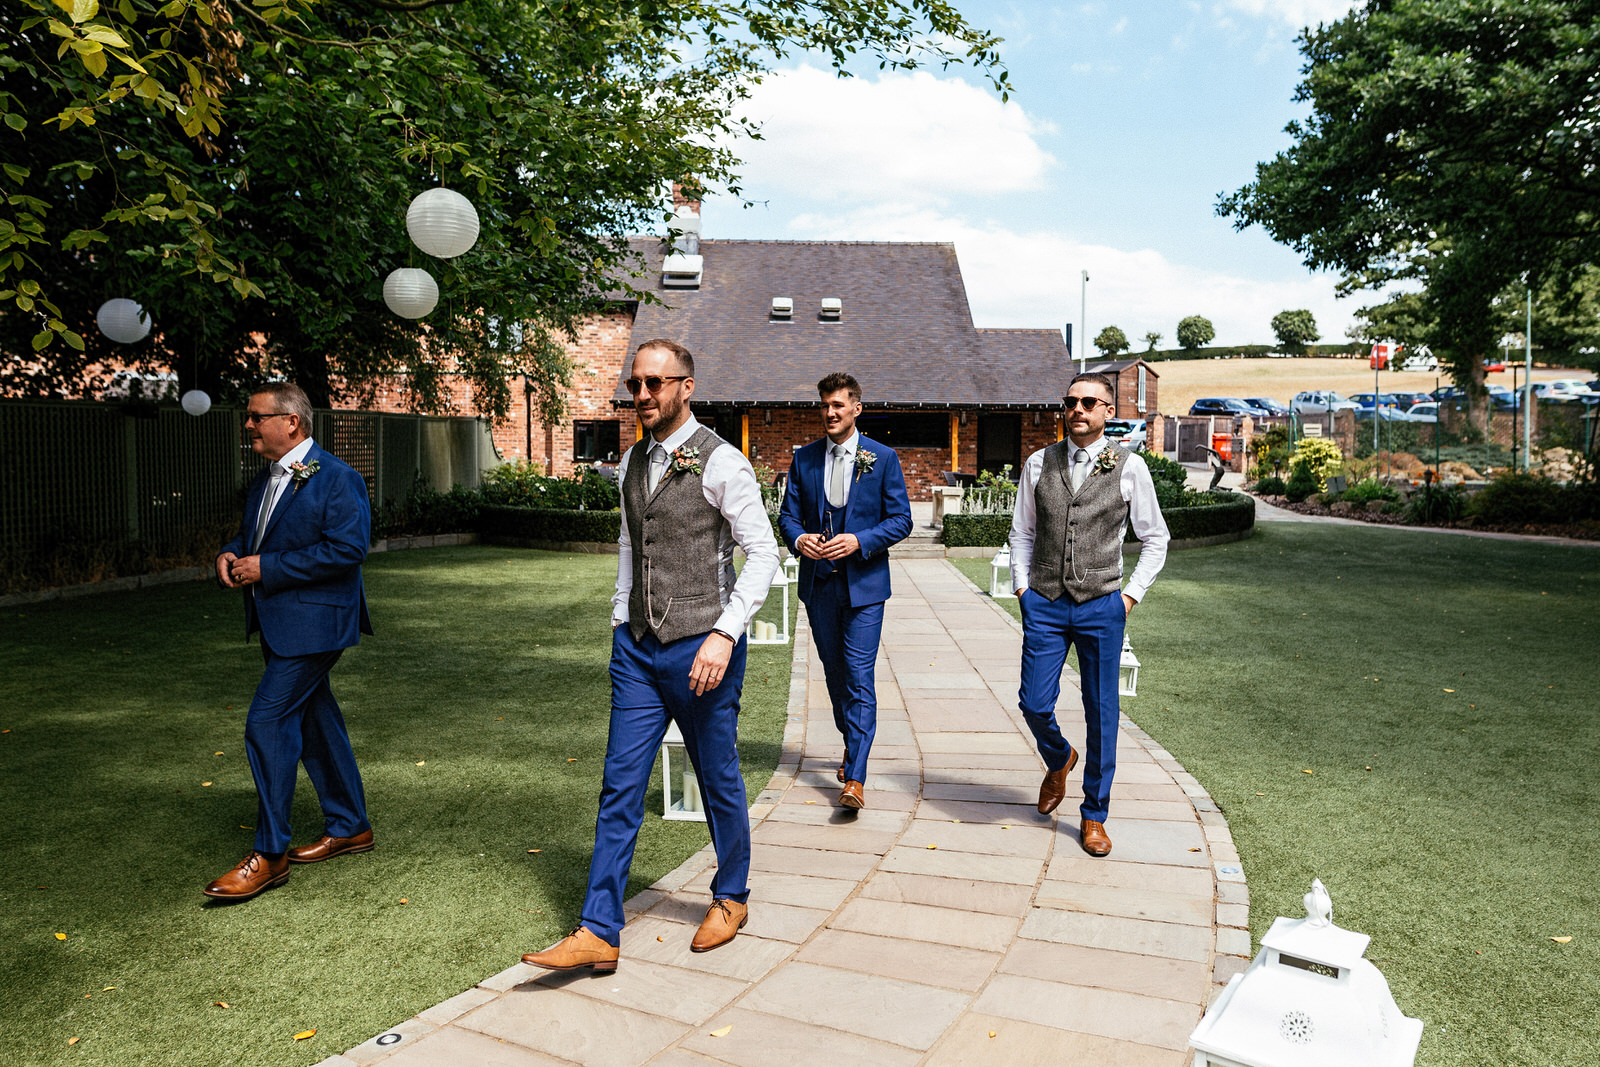 Moddershall-Oaks-Spa-Wedding-Photographer-014.jpg